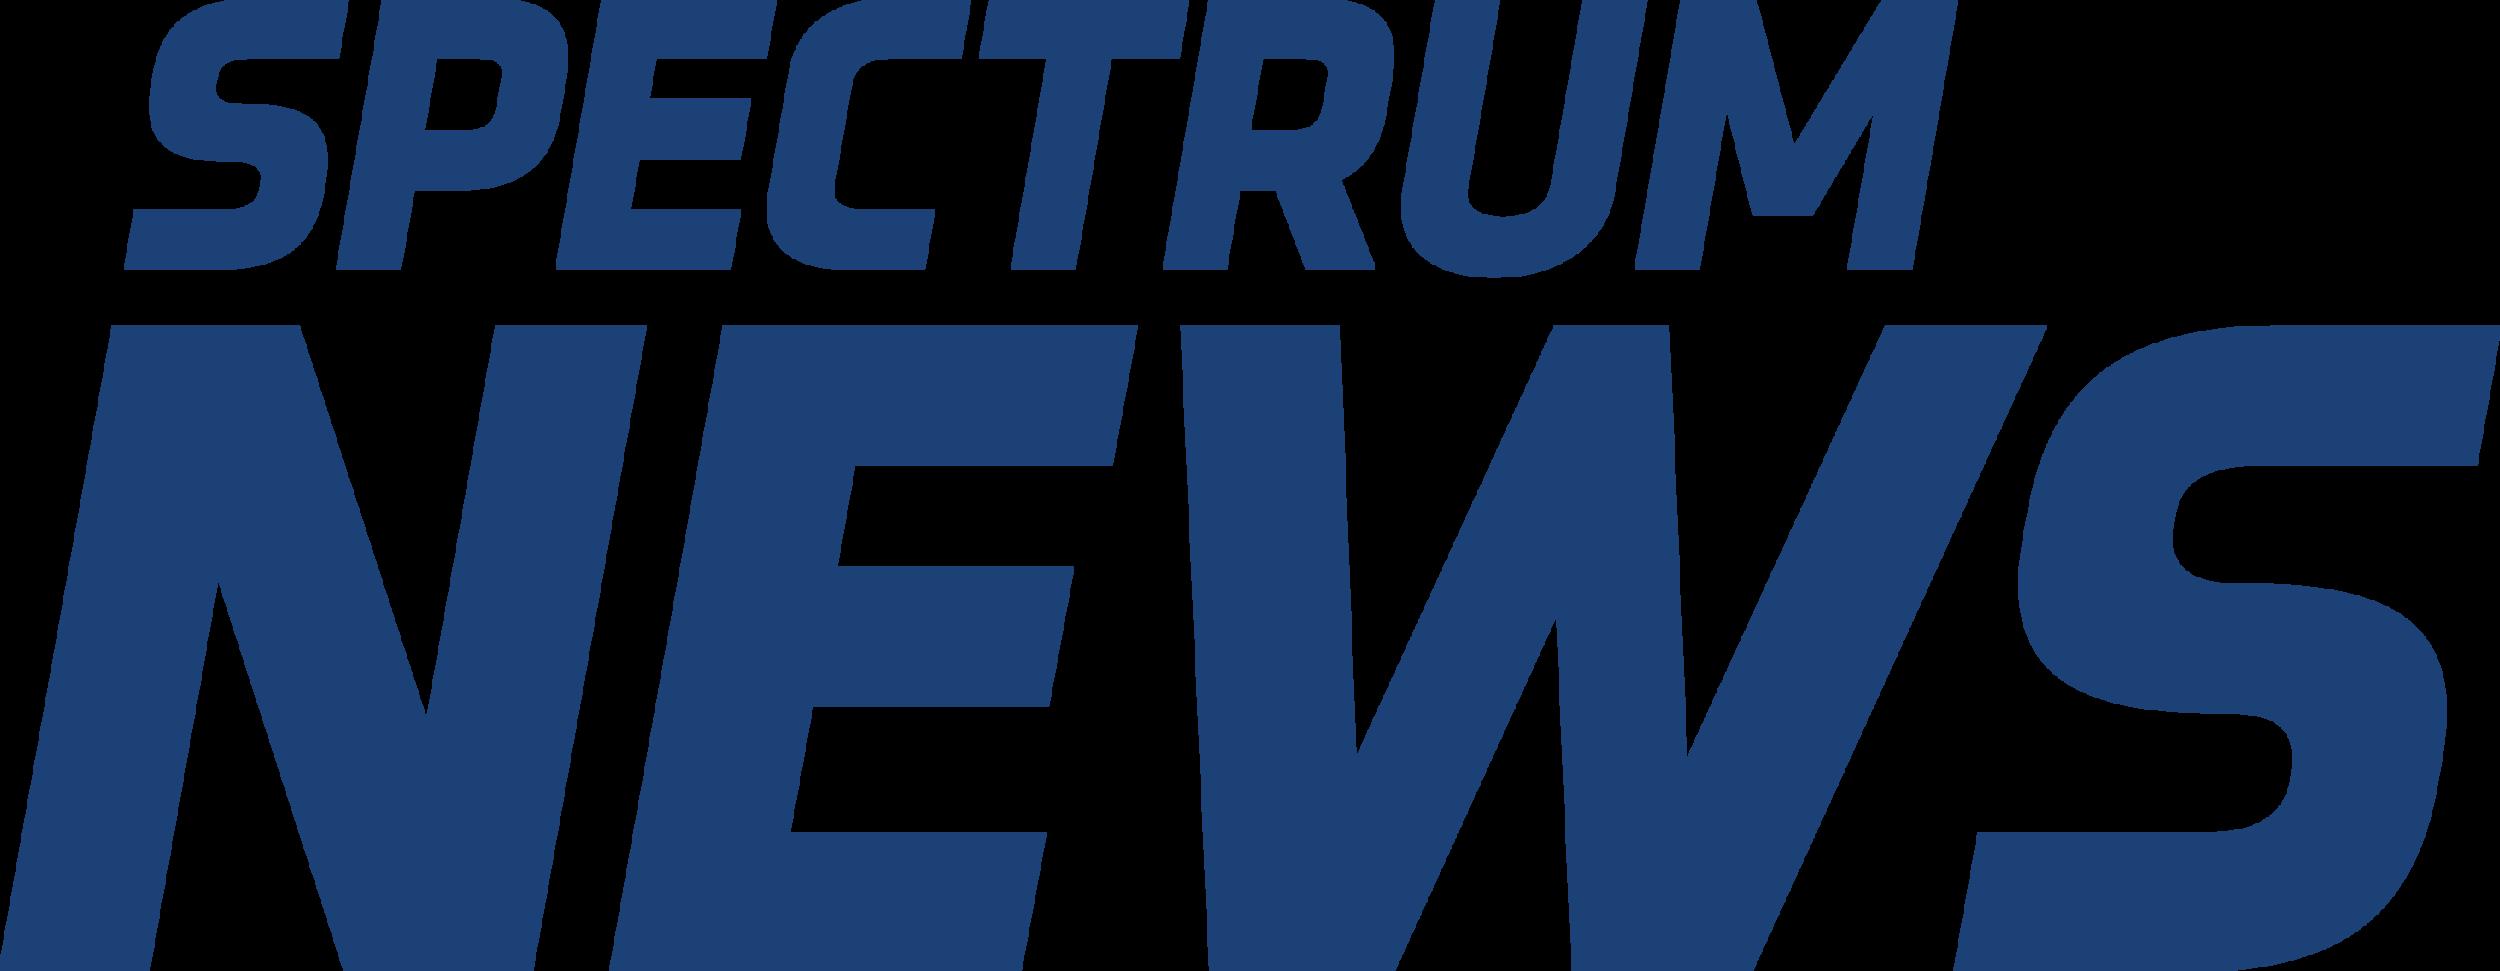 SPECTRUM_LOGO_NEWS_RGB_FLAT_BLUE_OW.png